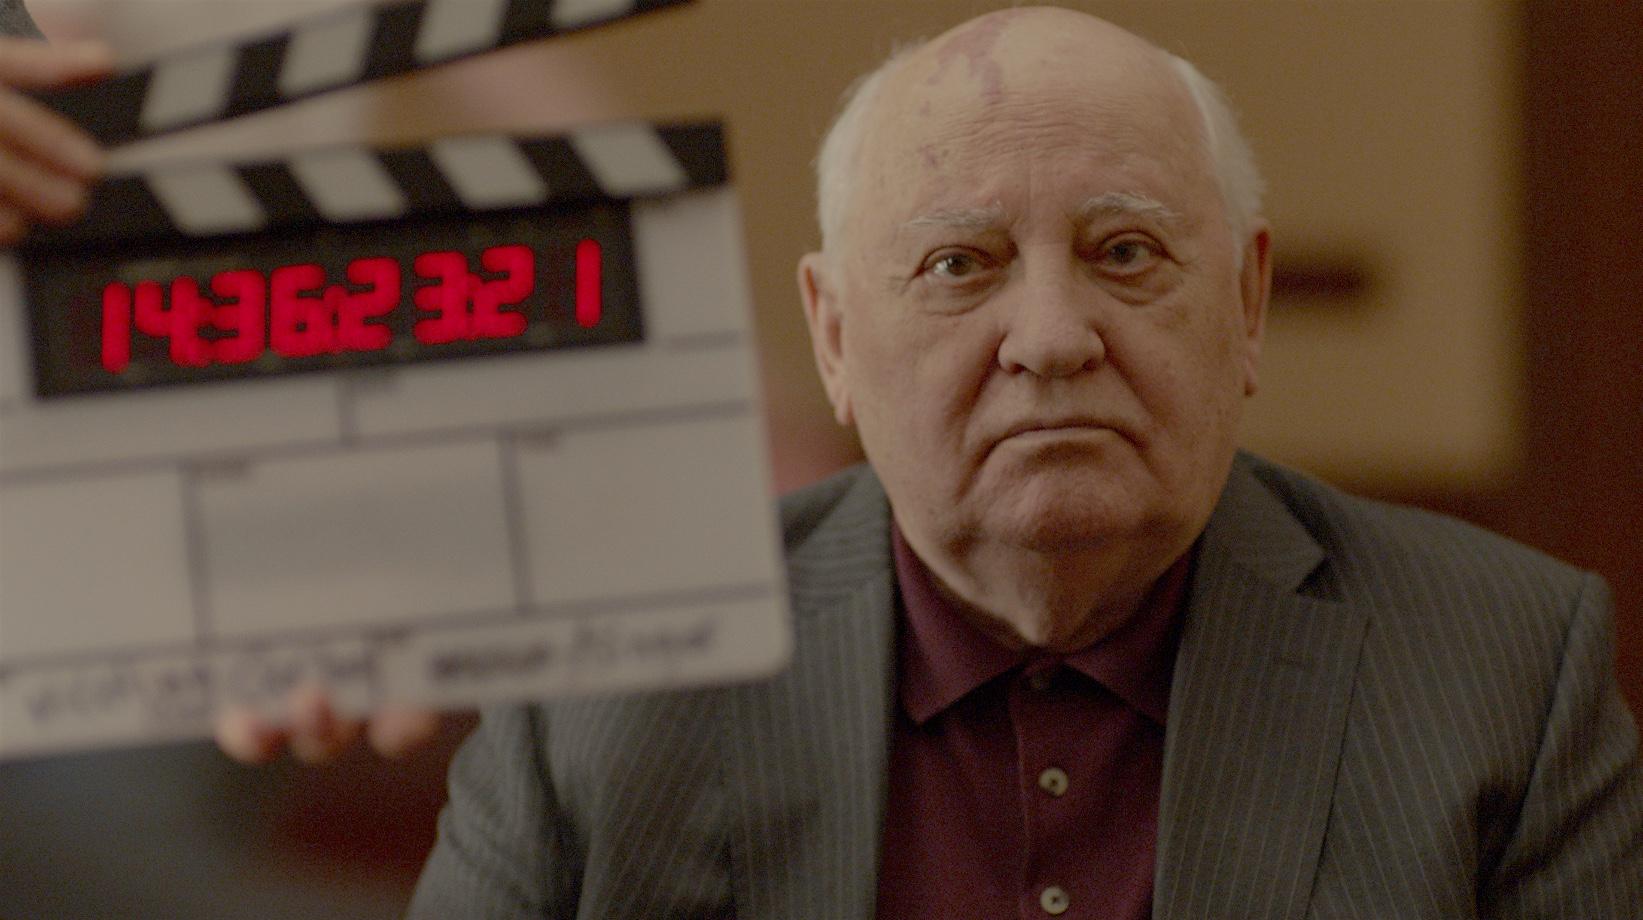 Gorbaciov_HERZOG INCONTRA GORBACIOV